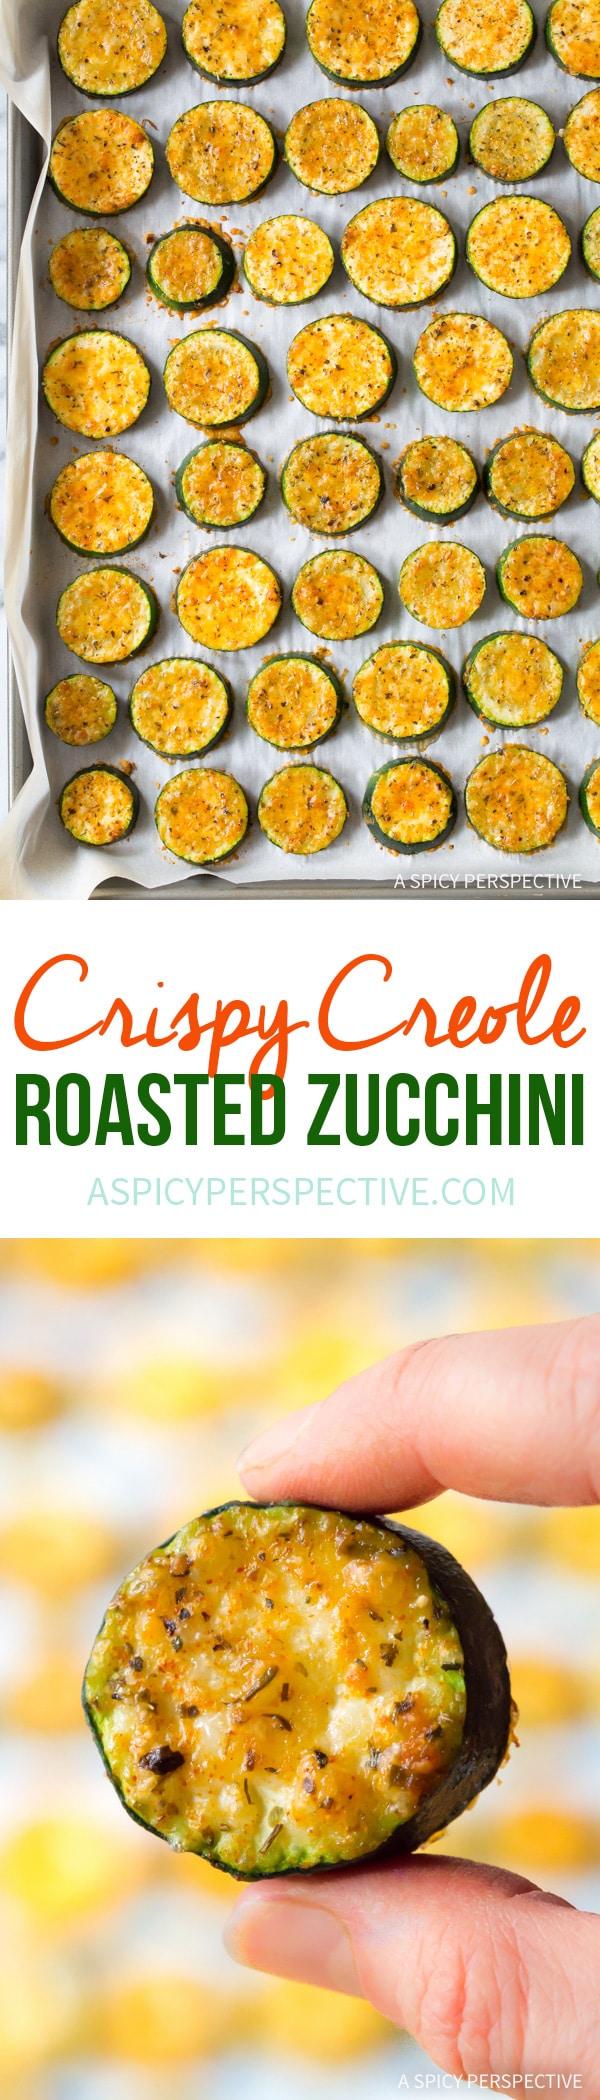 Healthy Crispy Creole Roasted Zucchini Recipe #healthy #lowcarb